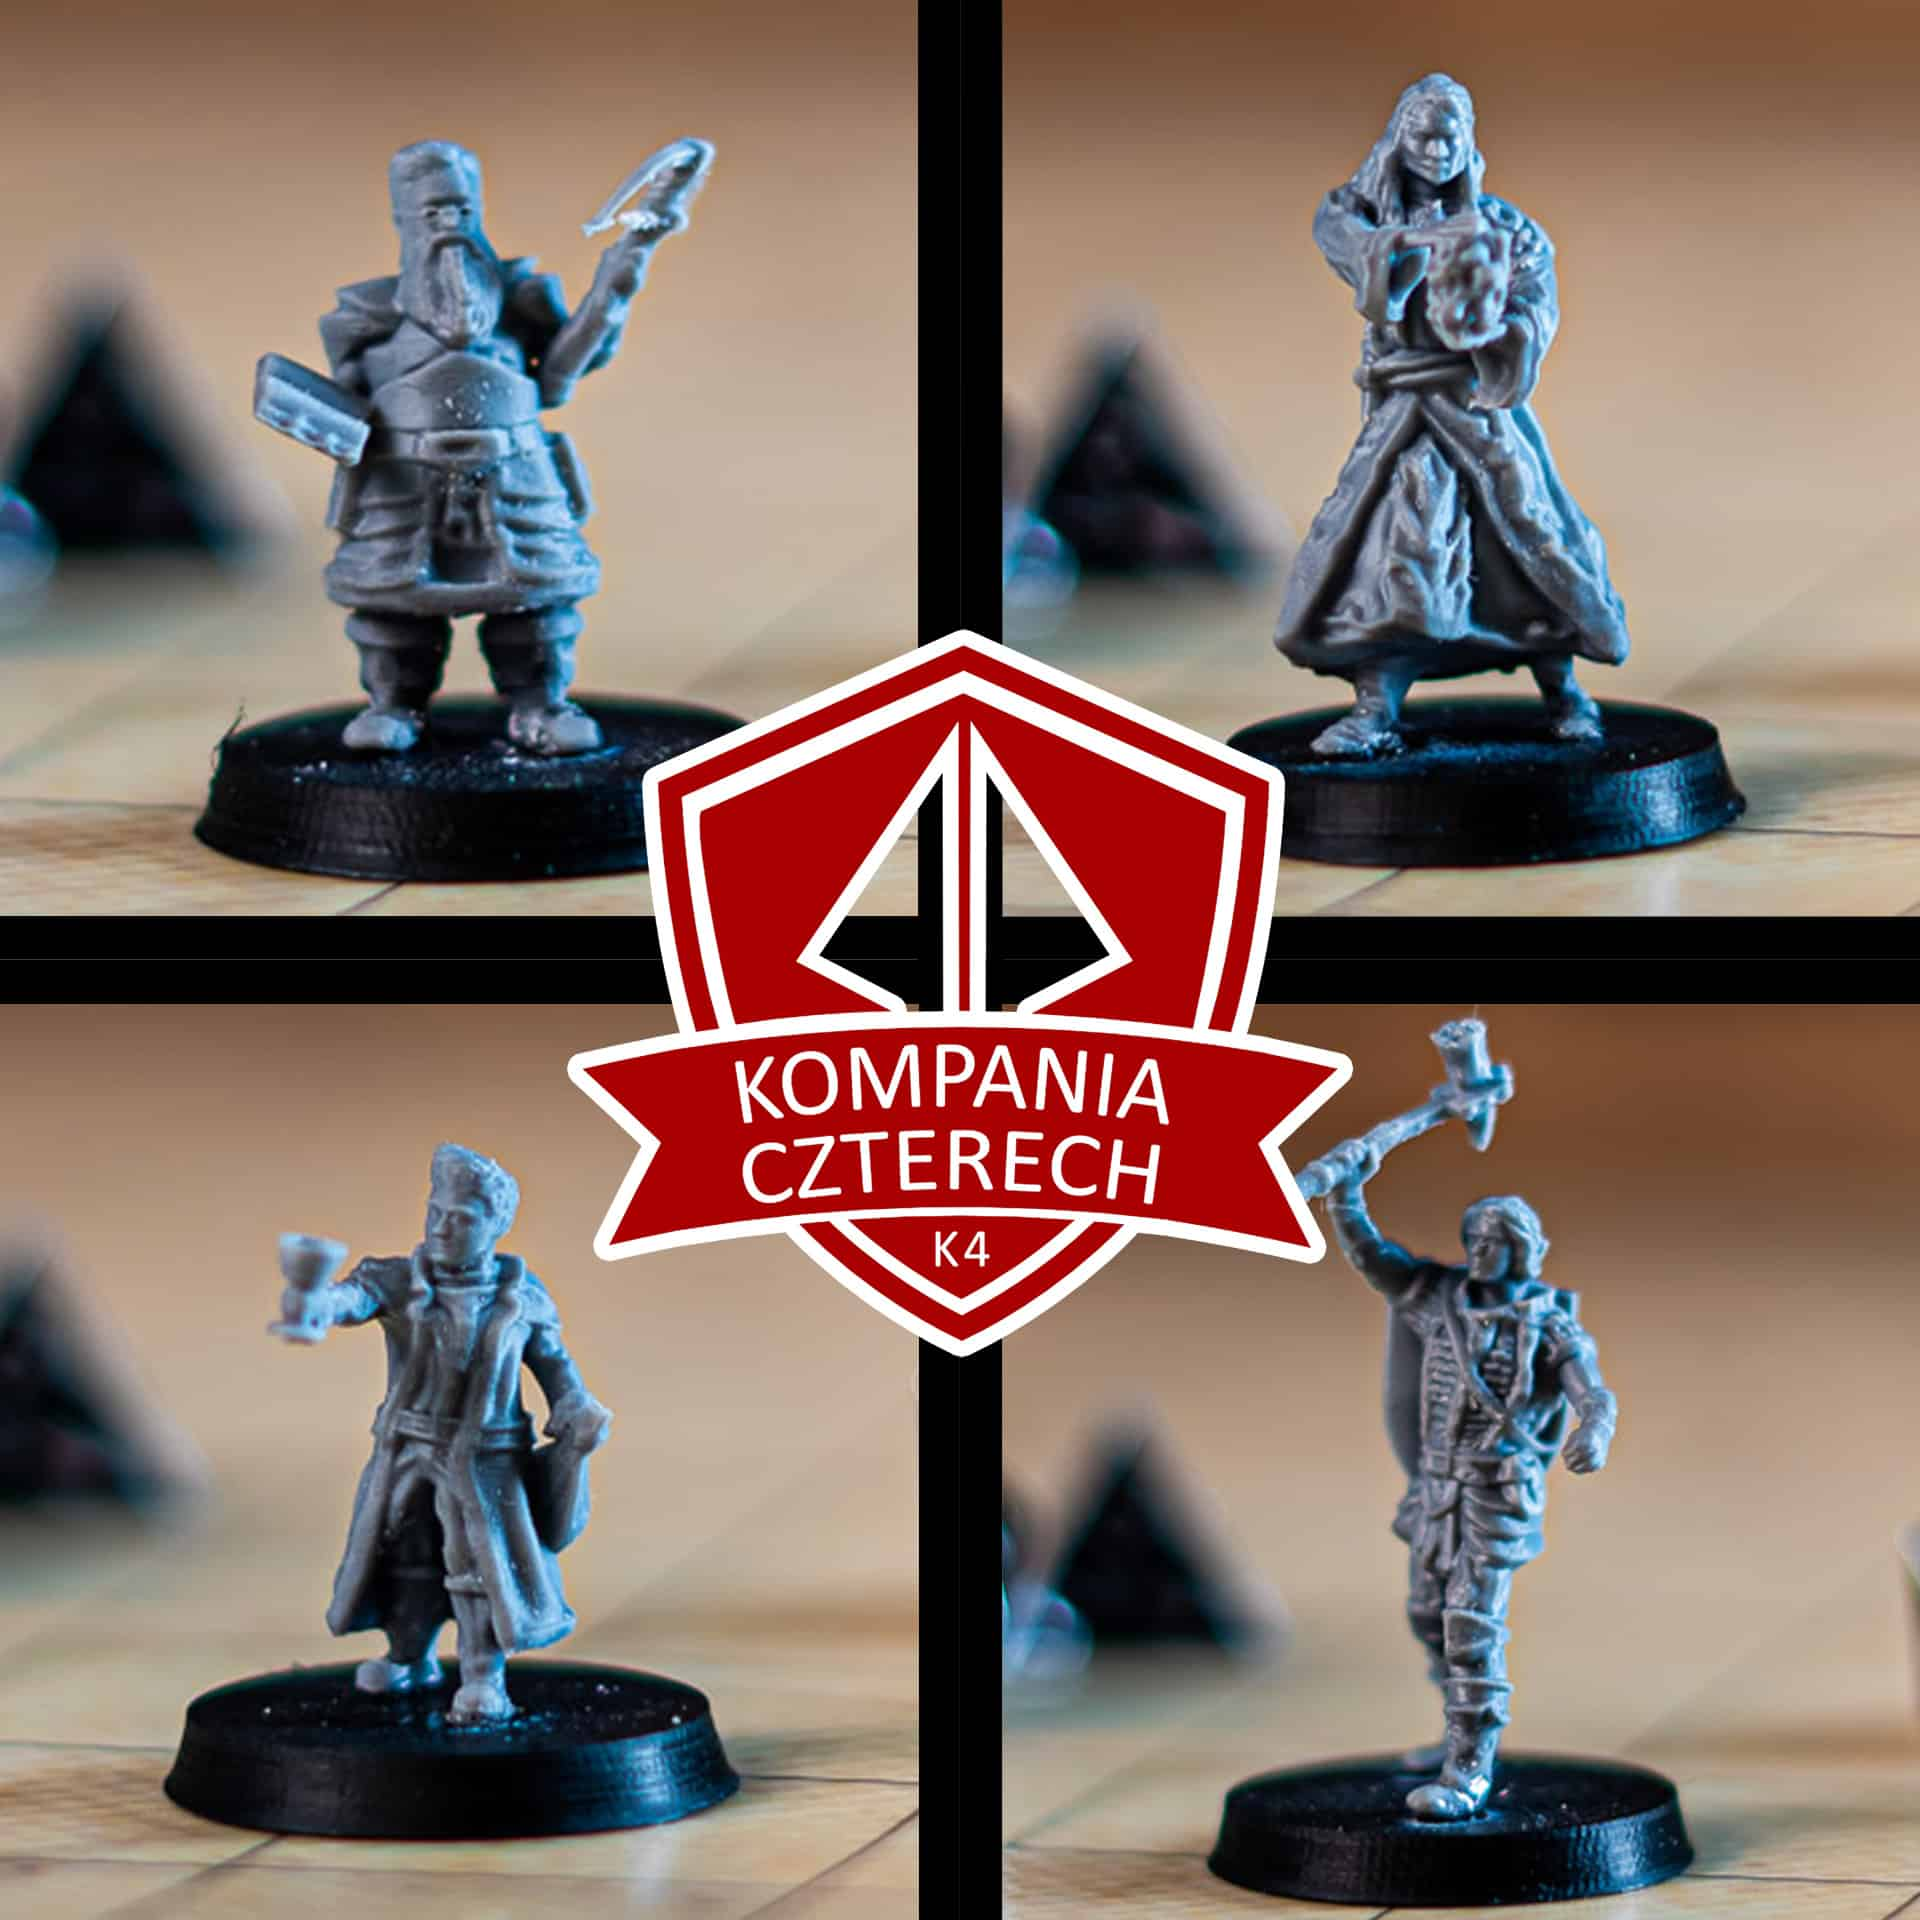 kompania czterech k4 fantasy adventurers party leonard human fighter with warhammer and shield 3d printable tabletop miniature photograph